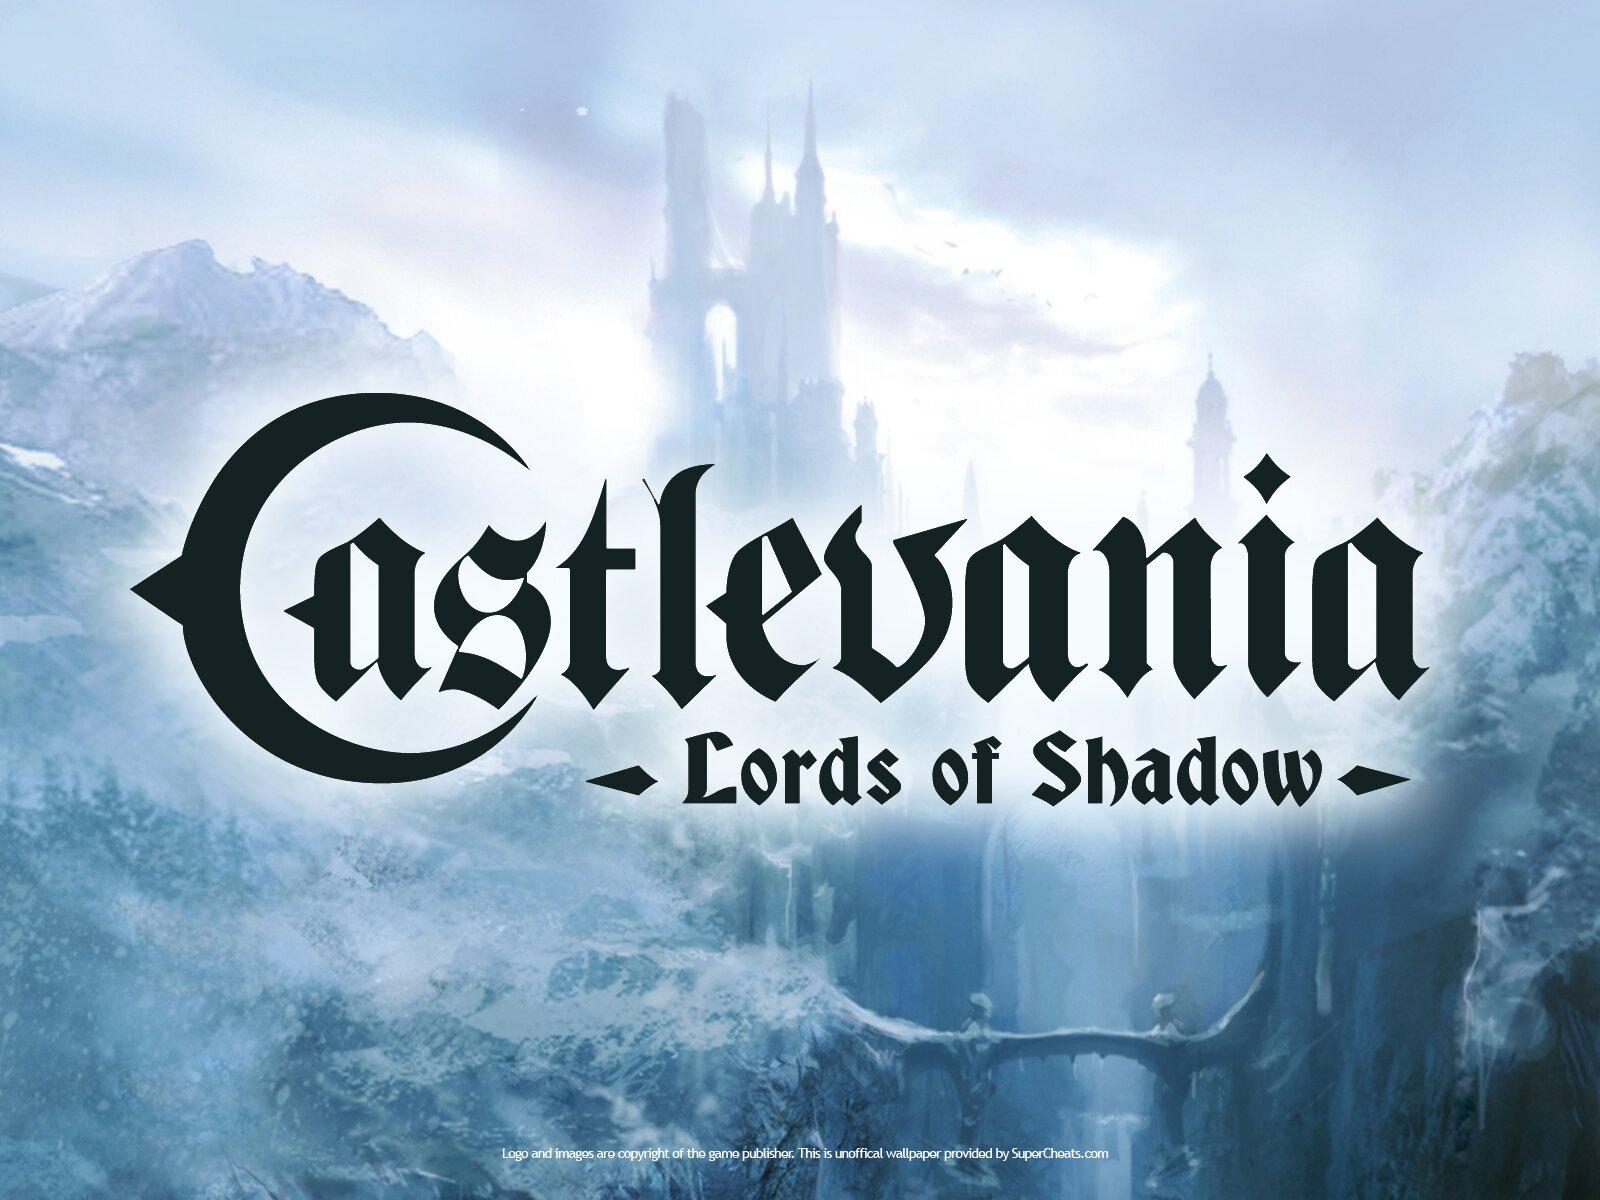 castlevanialordsofshadow-01